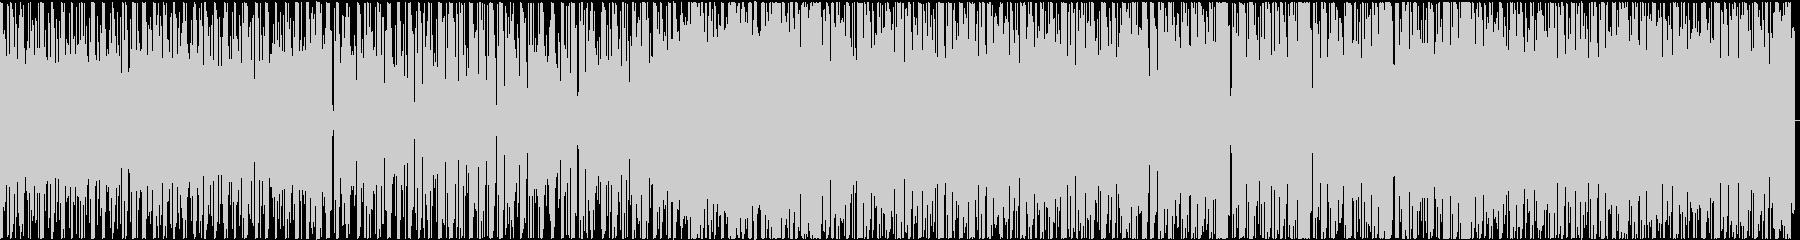 DJ/ダンス/EDM/TikTokの未再生の波形